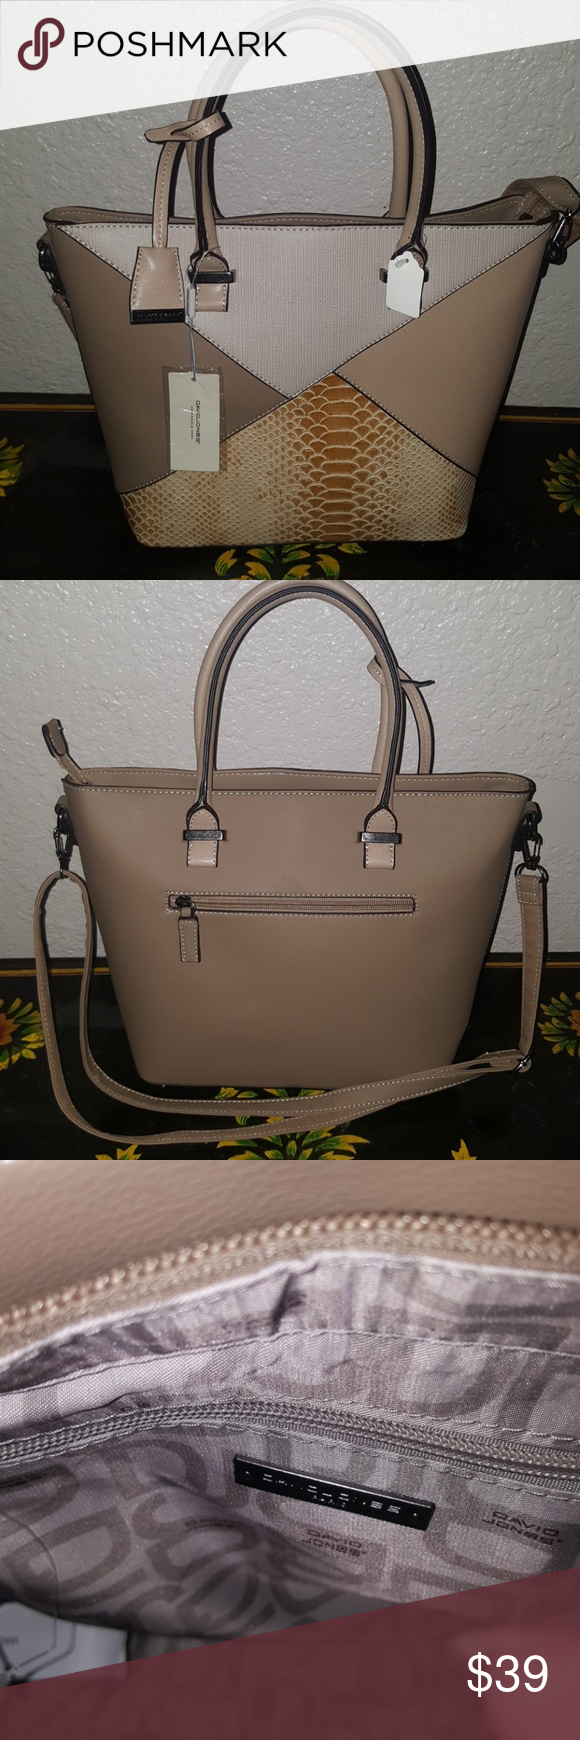 9acc95face Spotted while shopping on Poshmark  David Jones bag!  poshmark  fashion   shopping  style  David Jones  Handbags